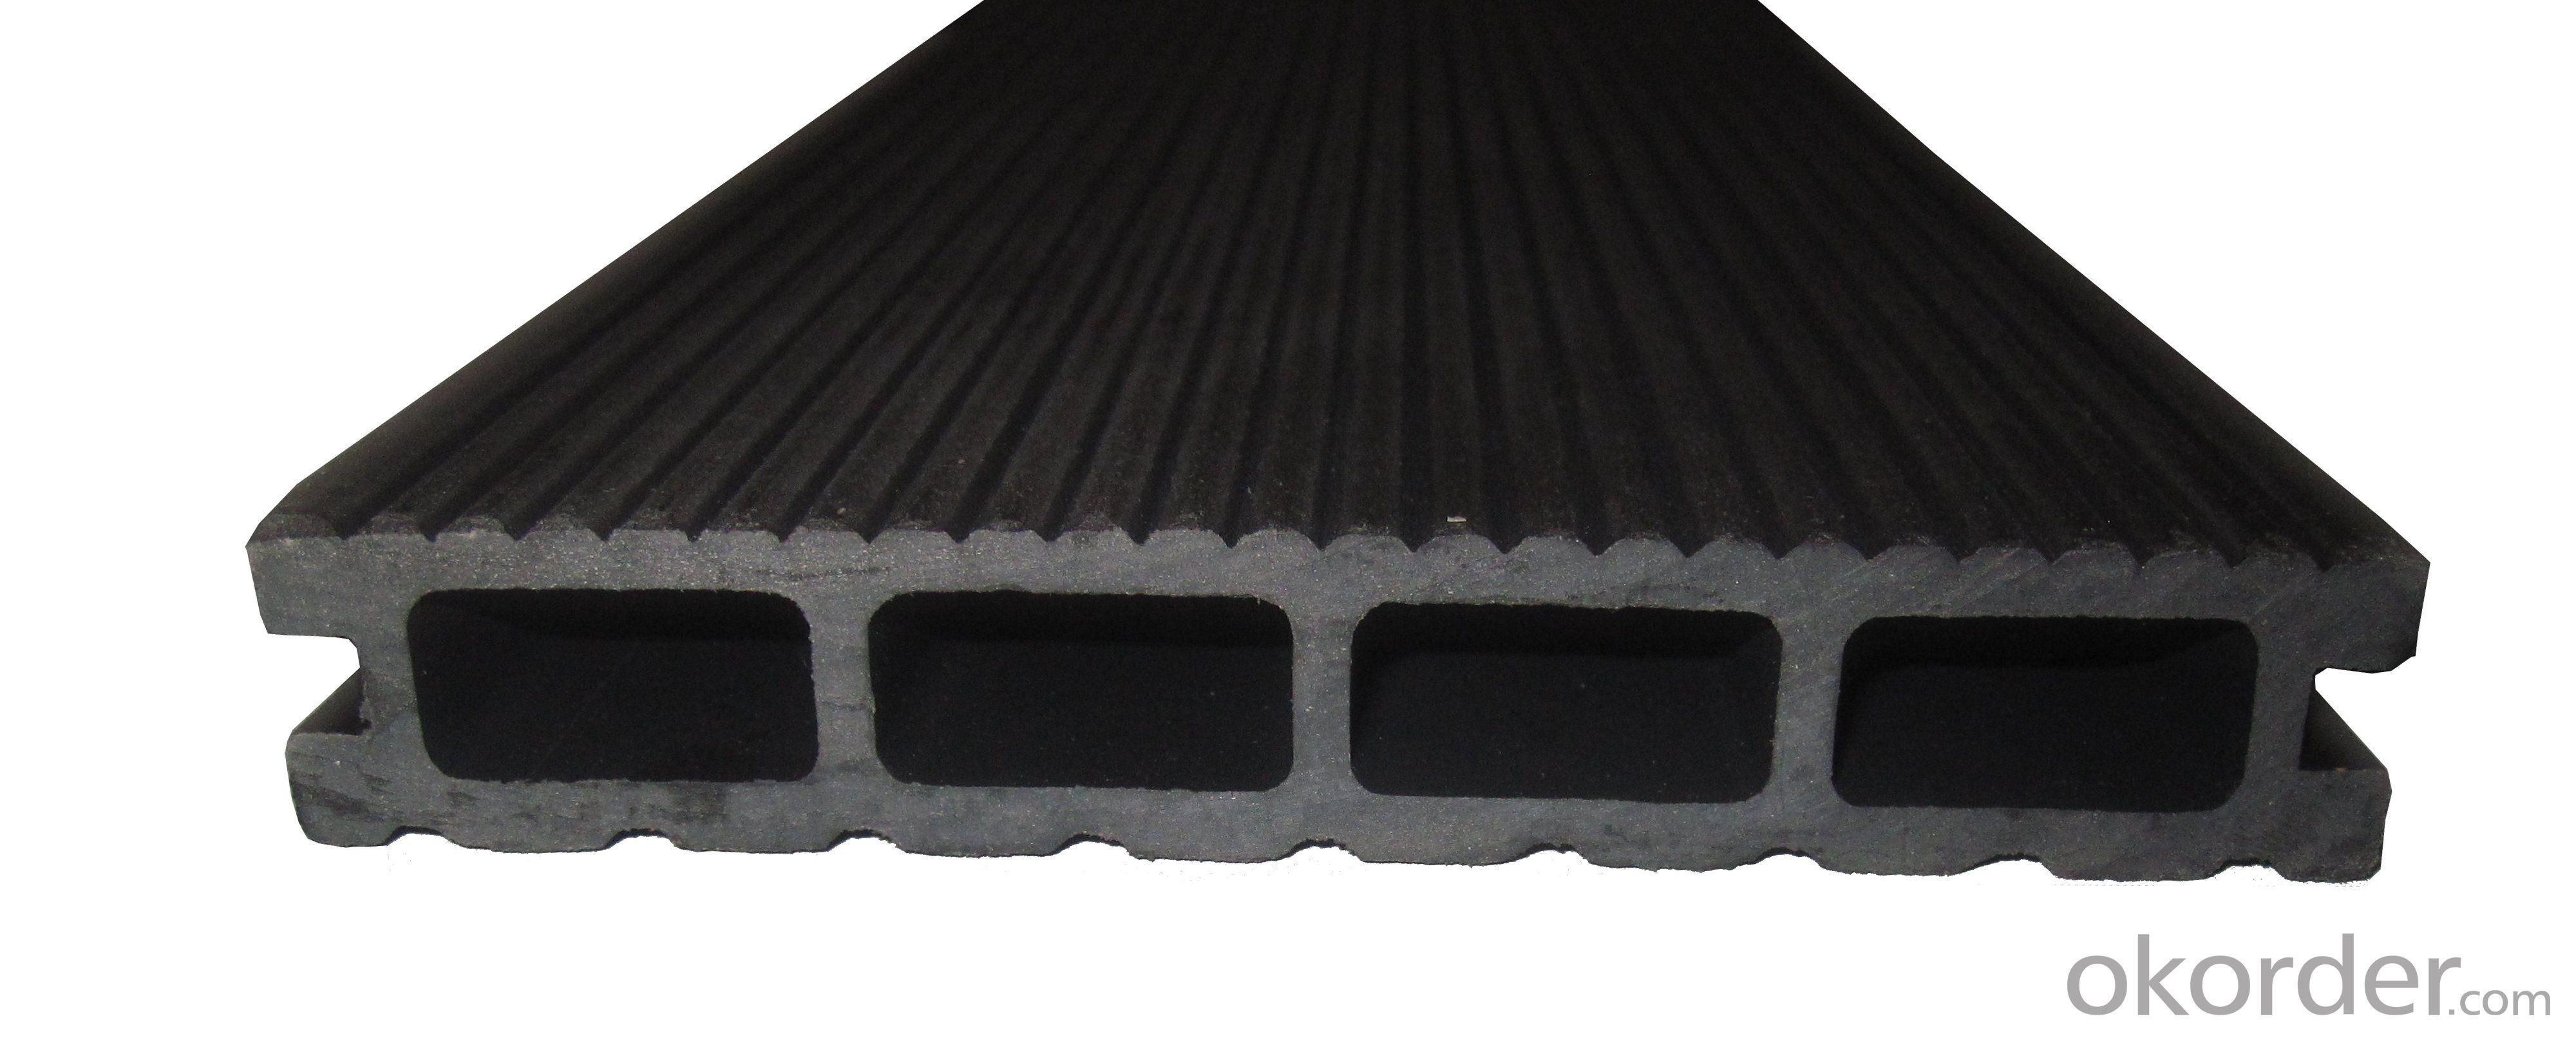 Anti-UV Waterproof Co-extrusion Wood Plastic Composite Playground Passed CE